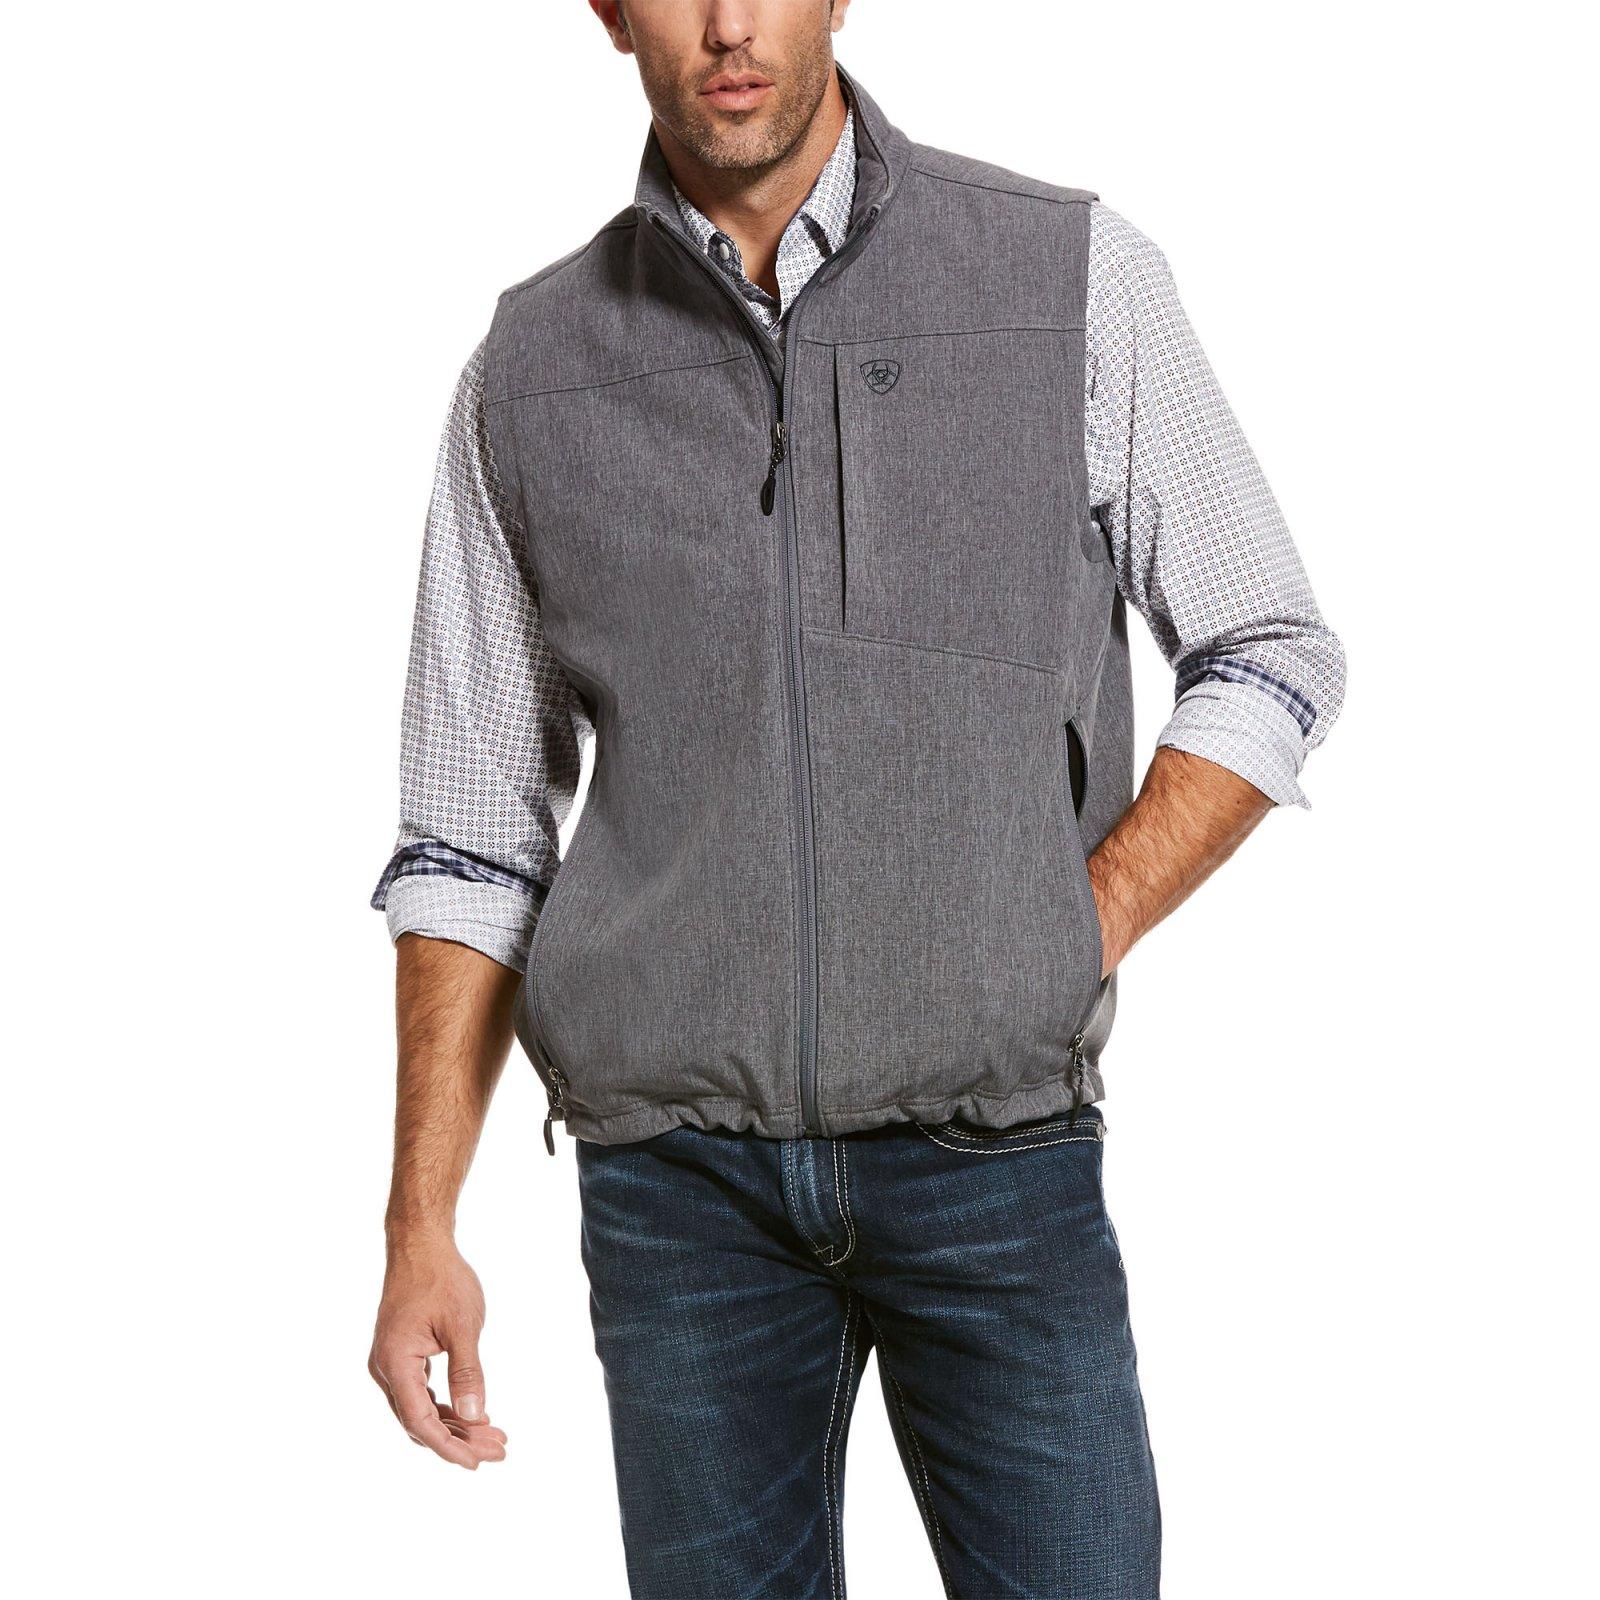 Men's Vernon 2.0 Softshell Vest from Ariat